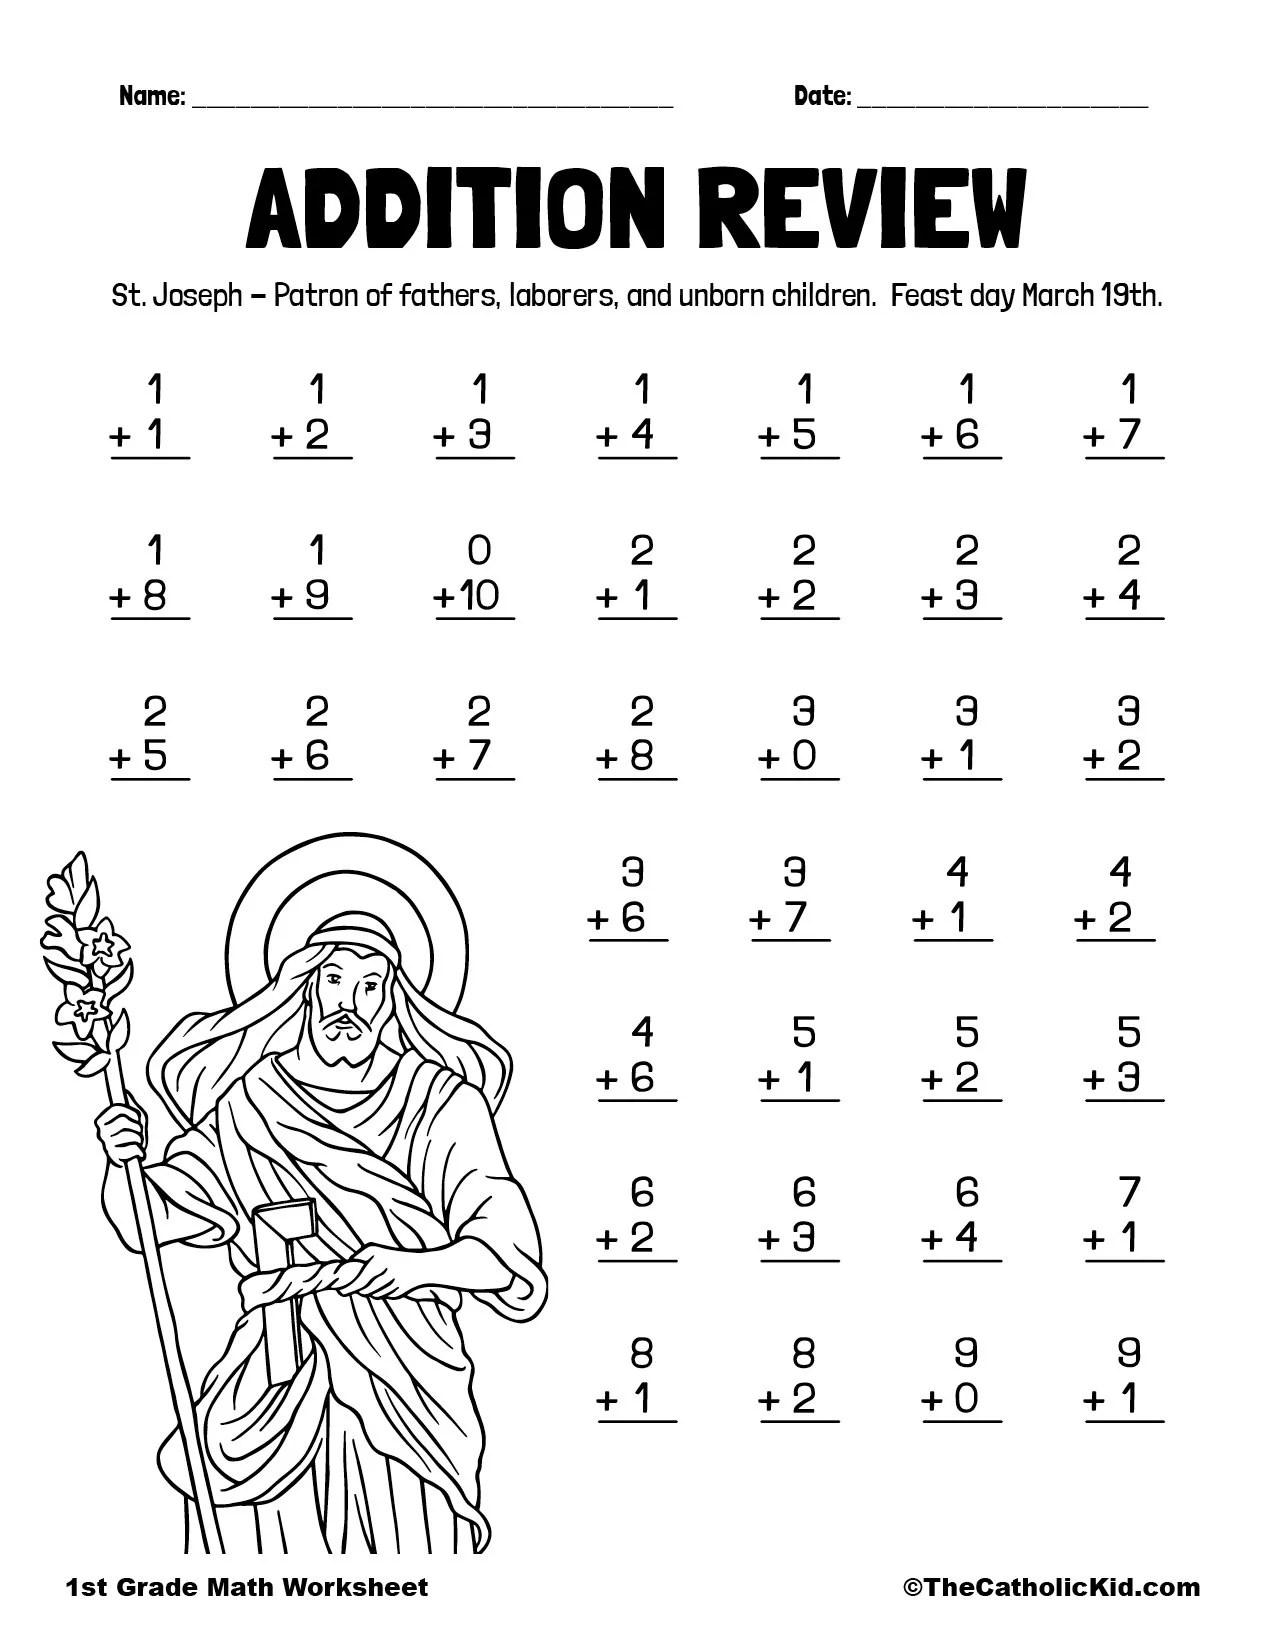 hight resolution of Addition Practice - 1st Grade Math Worksheet Catholic - TheCatholicKid.com